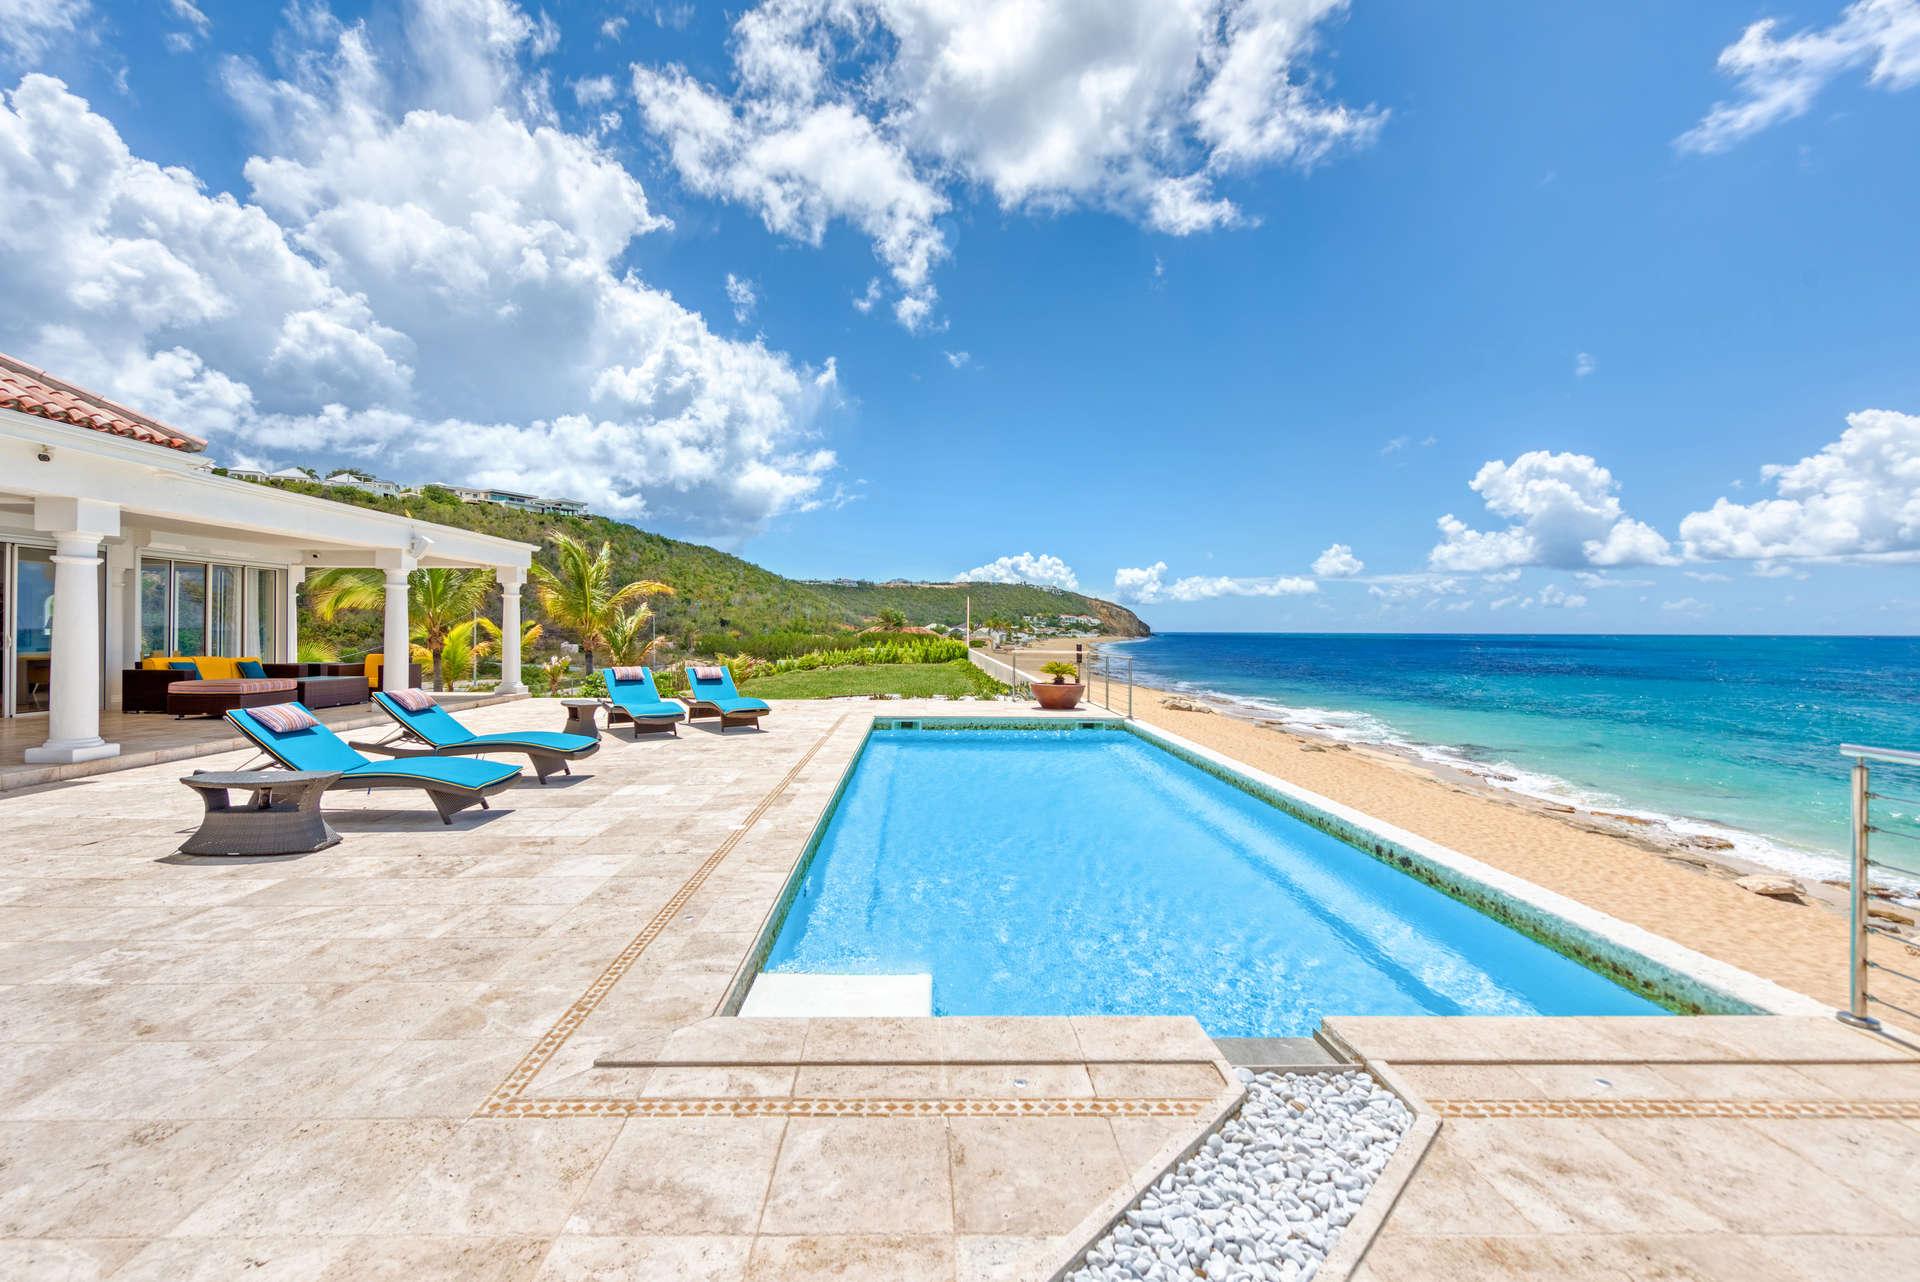 Luxury villa rentals caribbean - St martin - Saint martin french - Les terres basses - La Vie en Bleu - Image 1/26